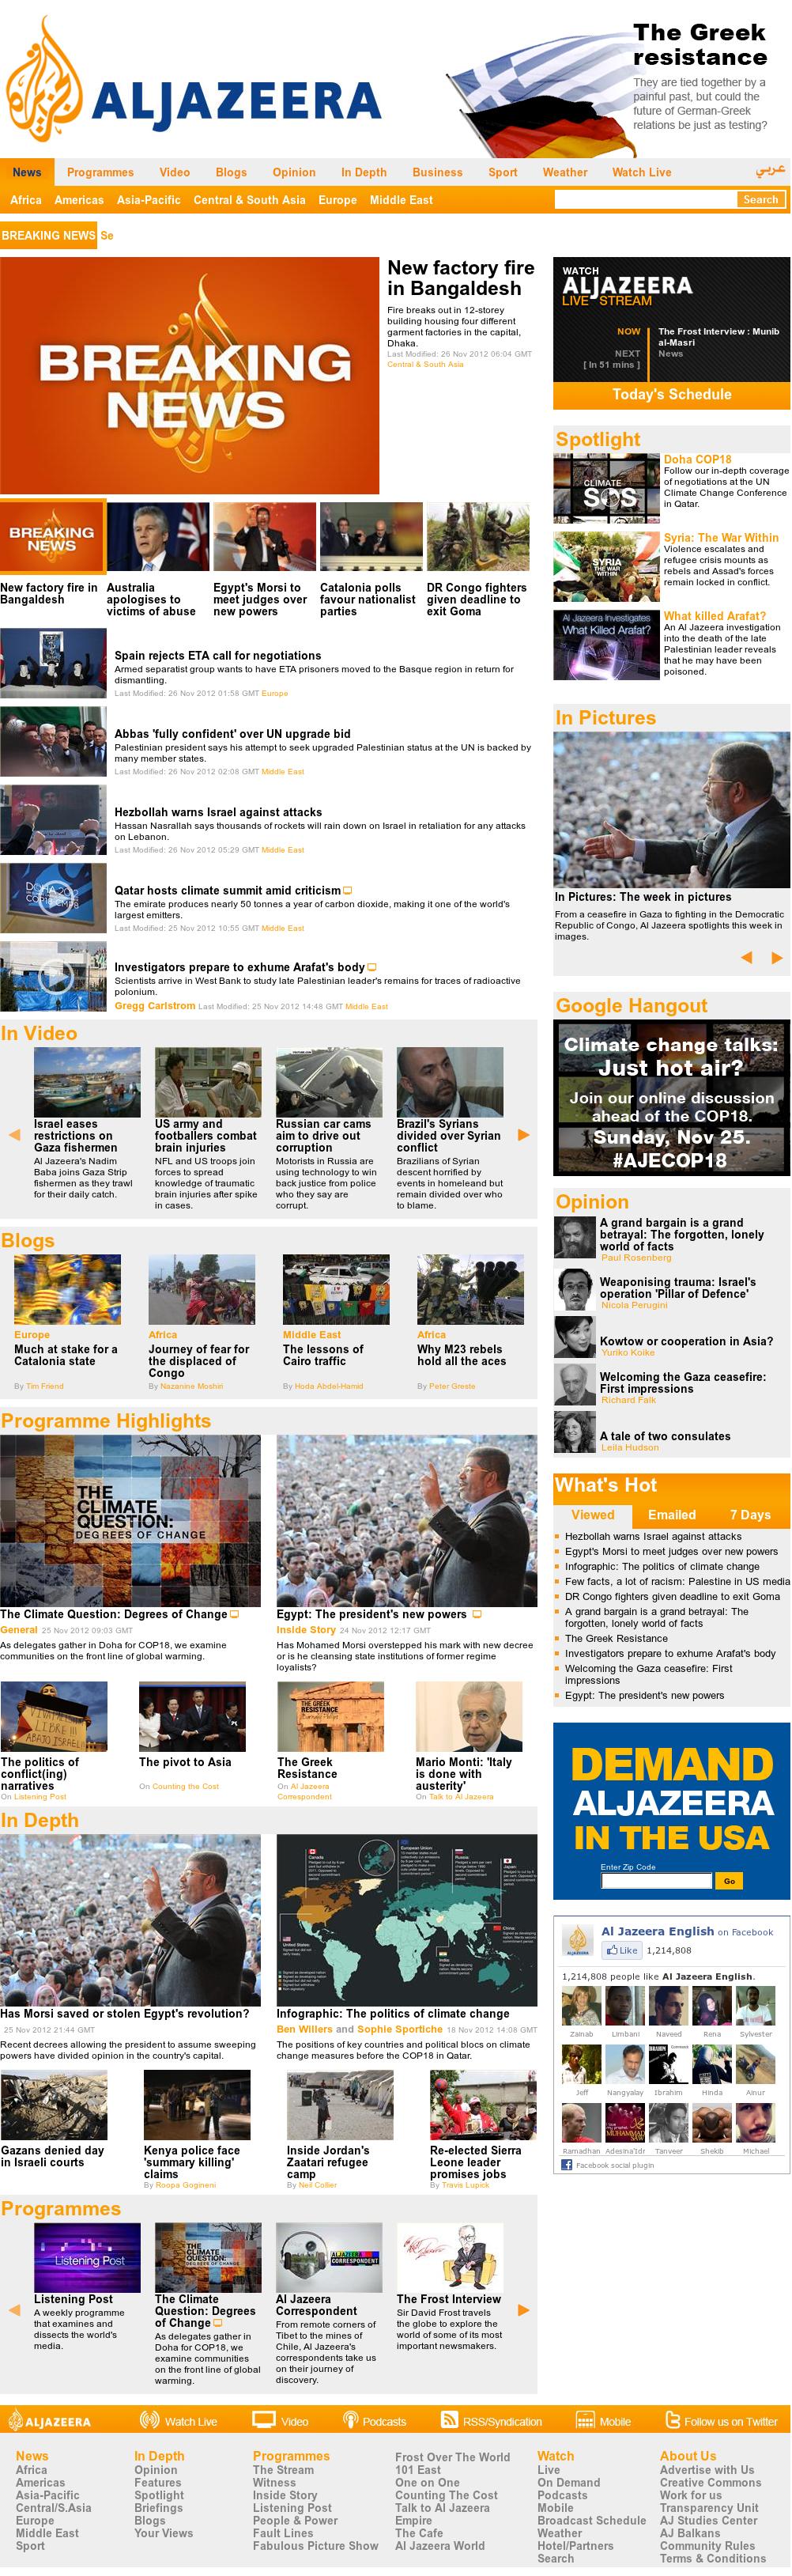 Al Jazeera (English) at Monday Nov. 26, 2012, 6:13 a.m. UTC